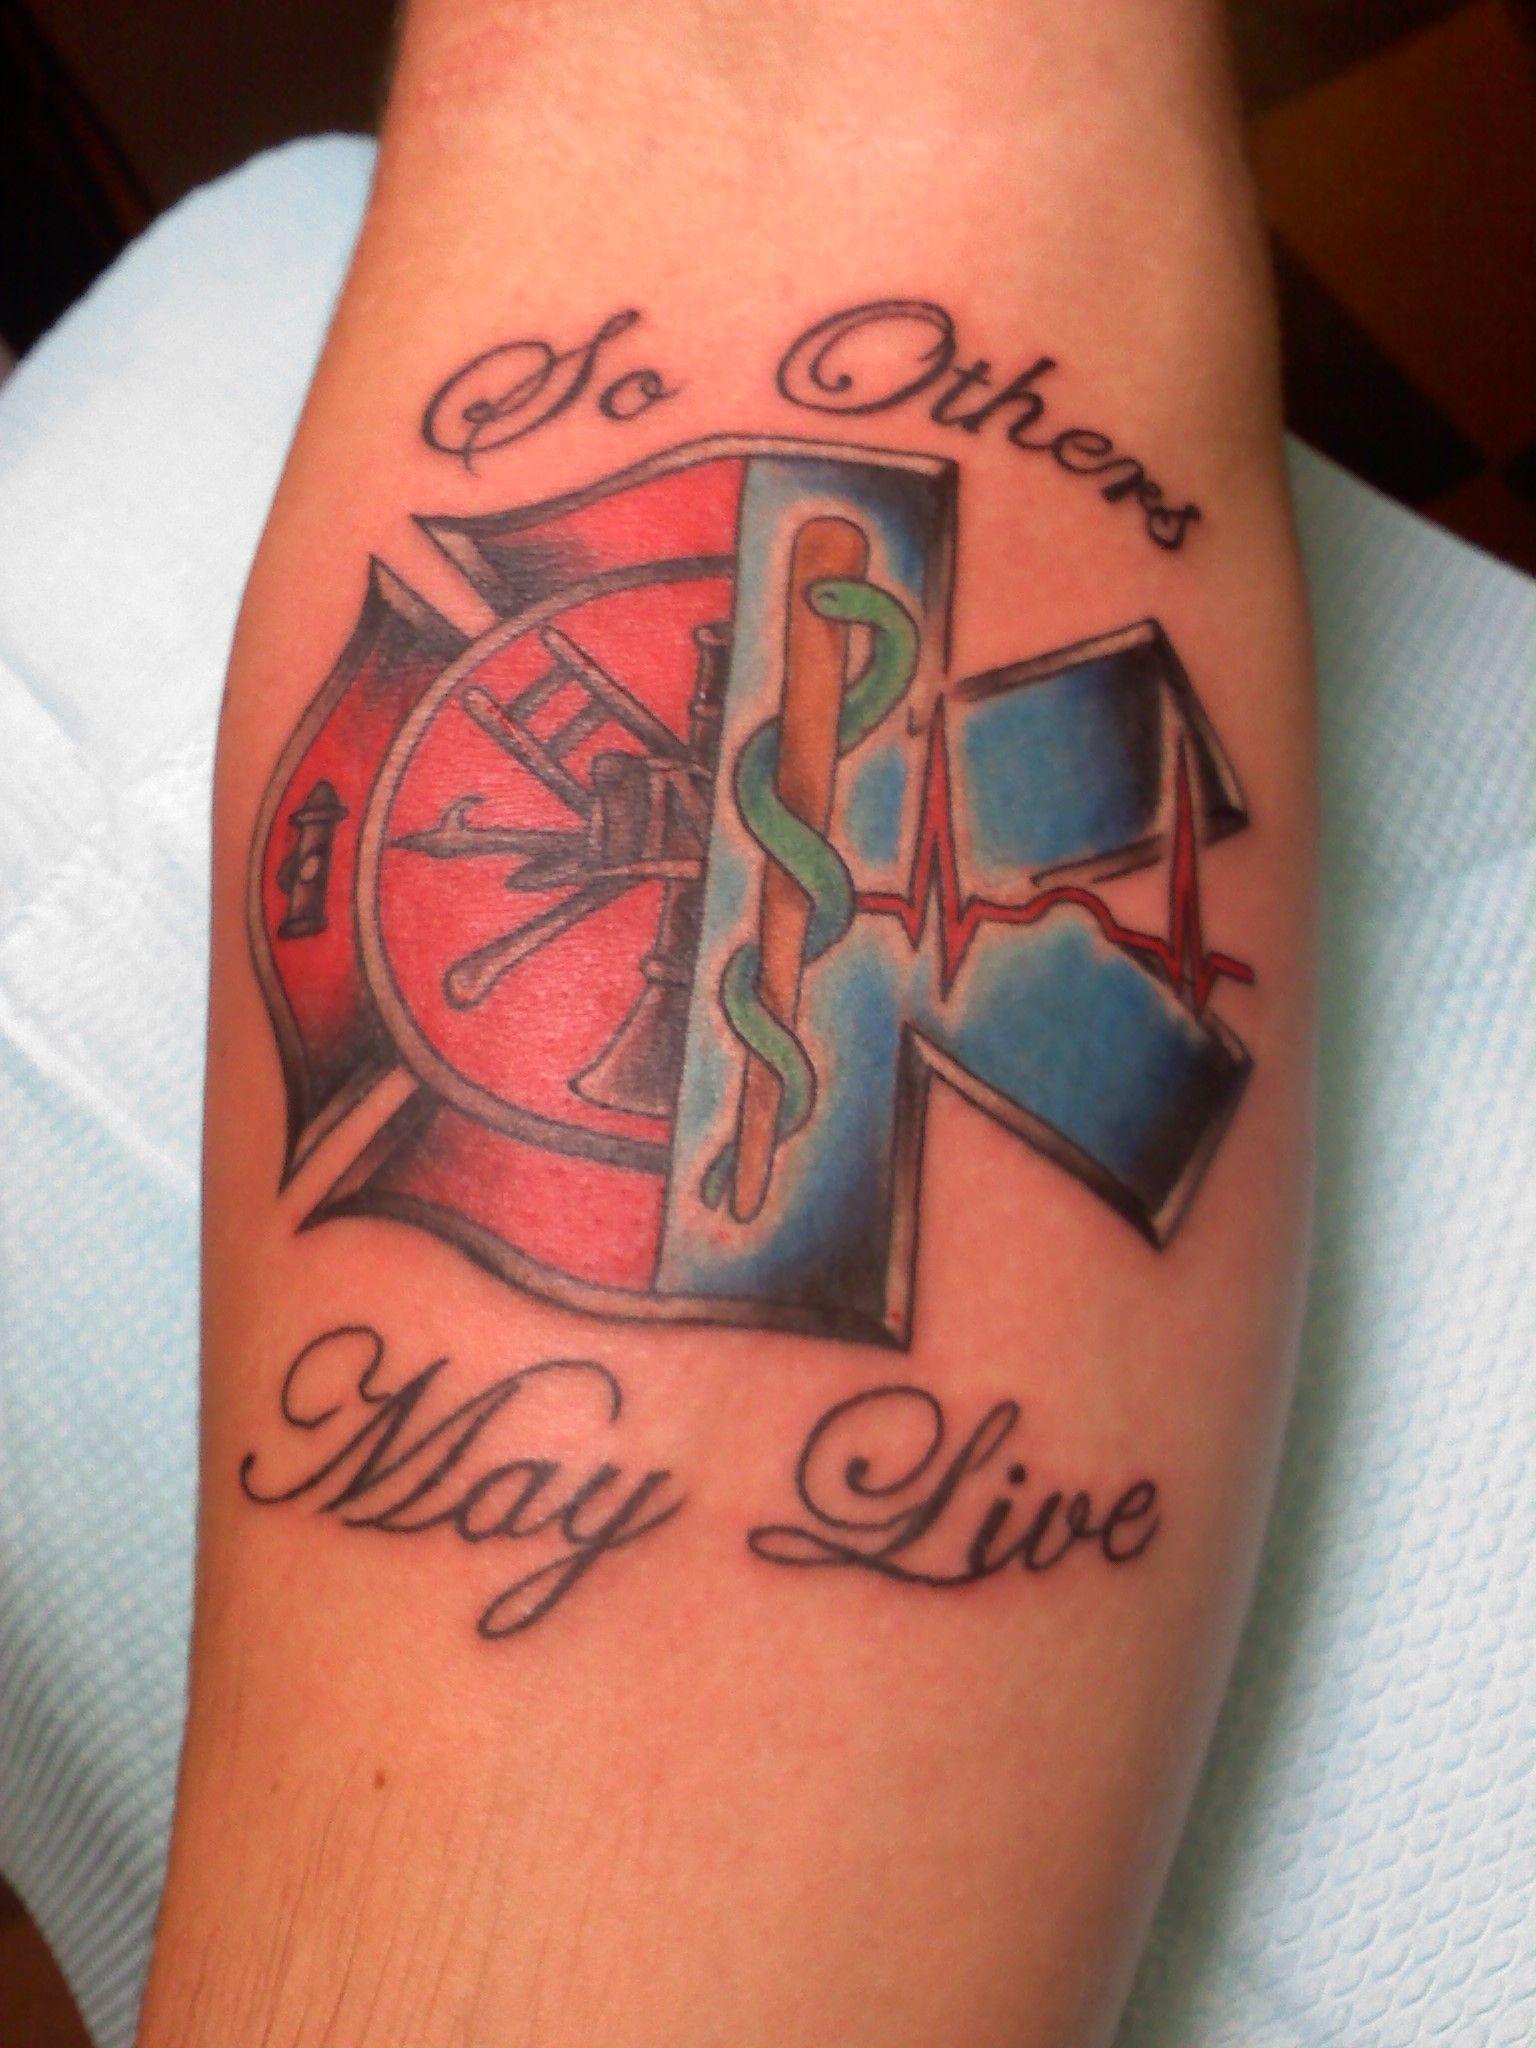 Ems tattoo quotes quotesgram tattoo ideas pinterest ems ems tattoo quotes quotesgram biocorpaavc Gallery